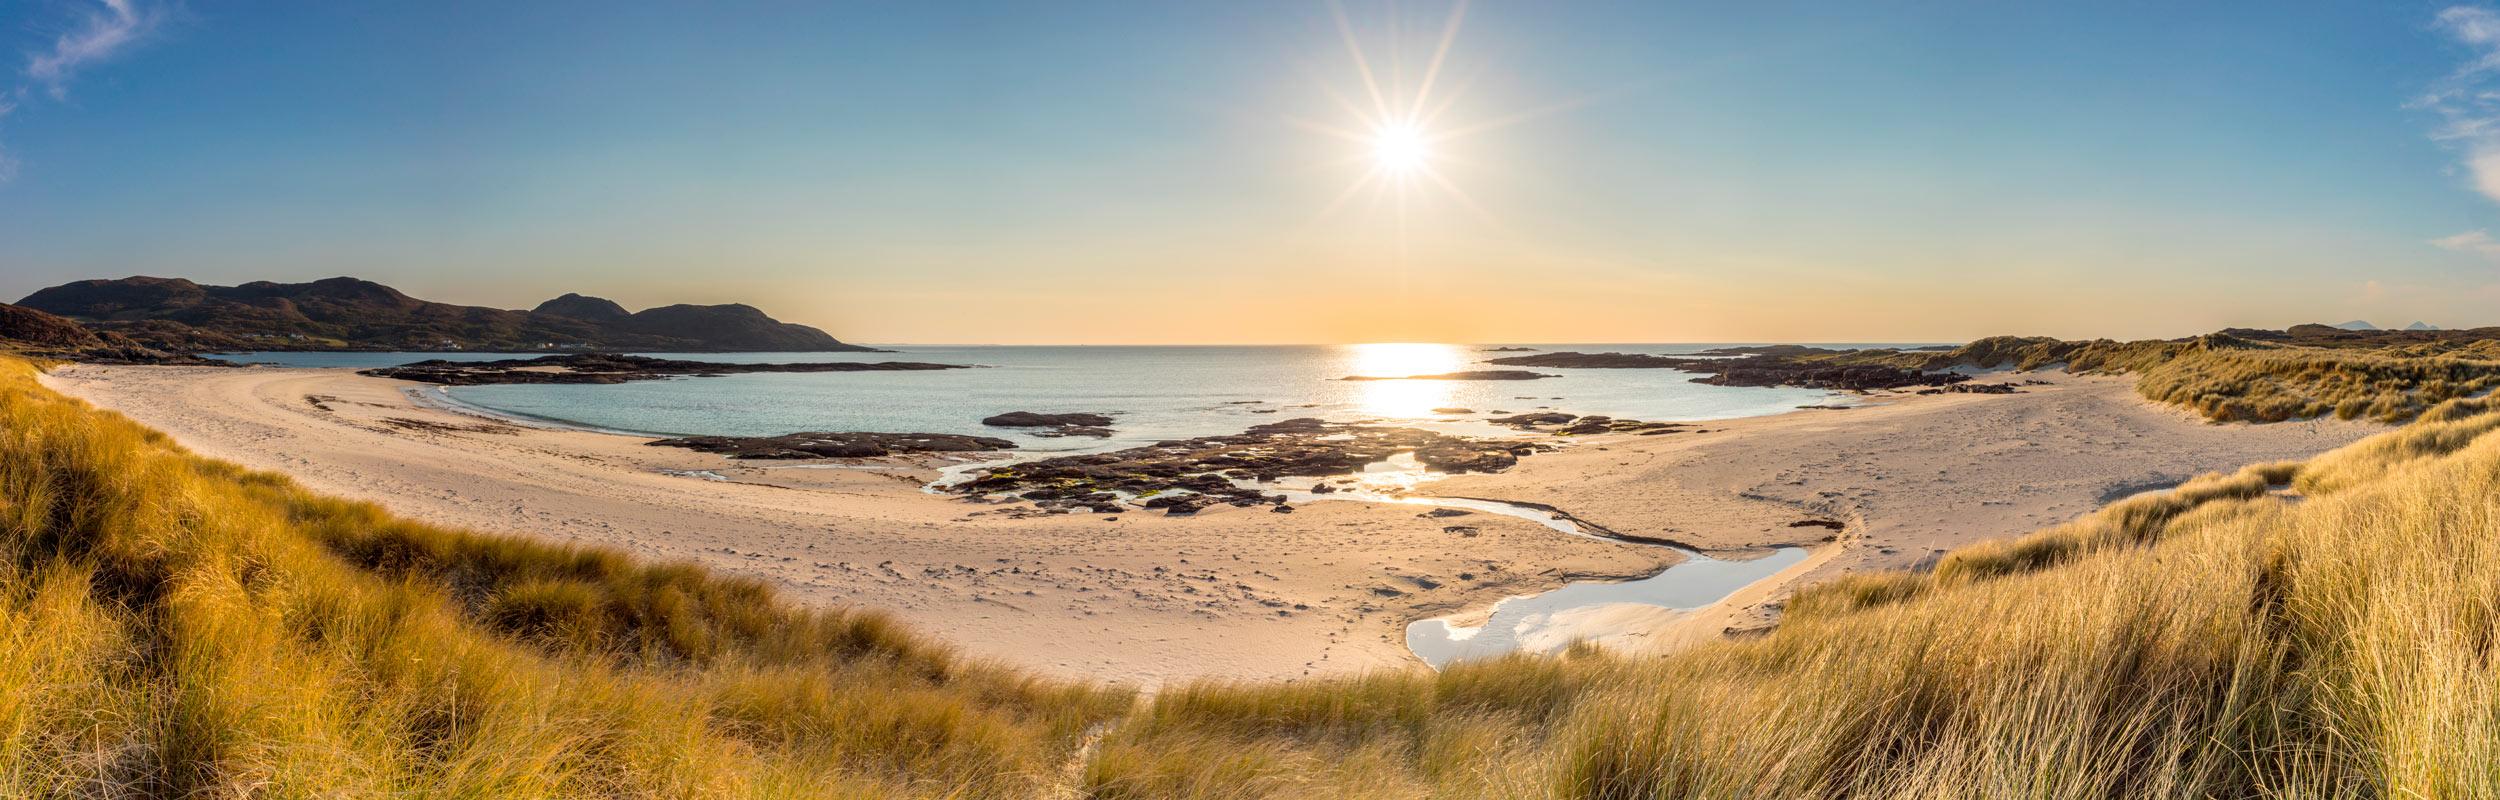 Sanna Bay,Ardnamurchan, Scotland  (Adam Major/Shutterstock)